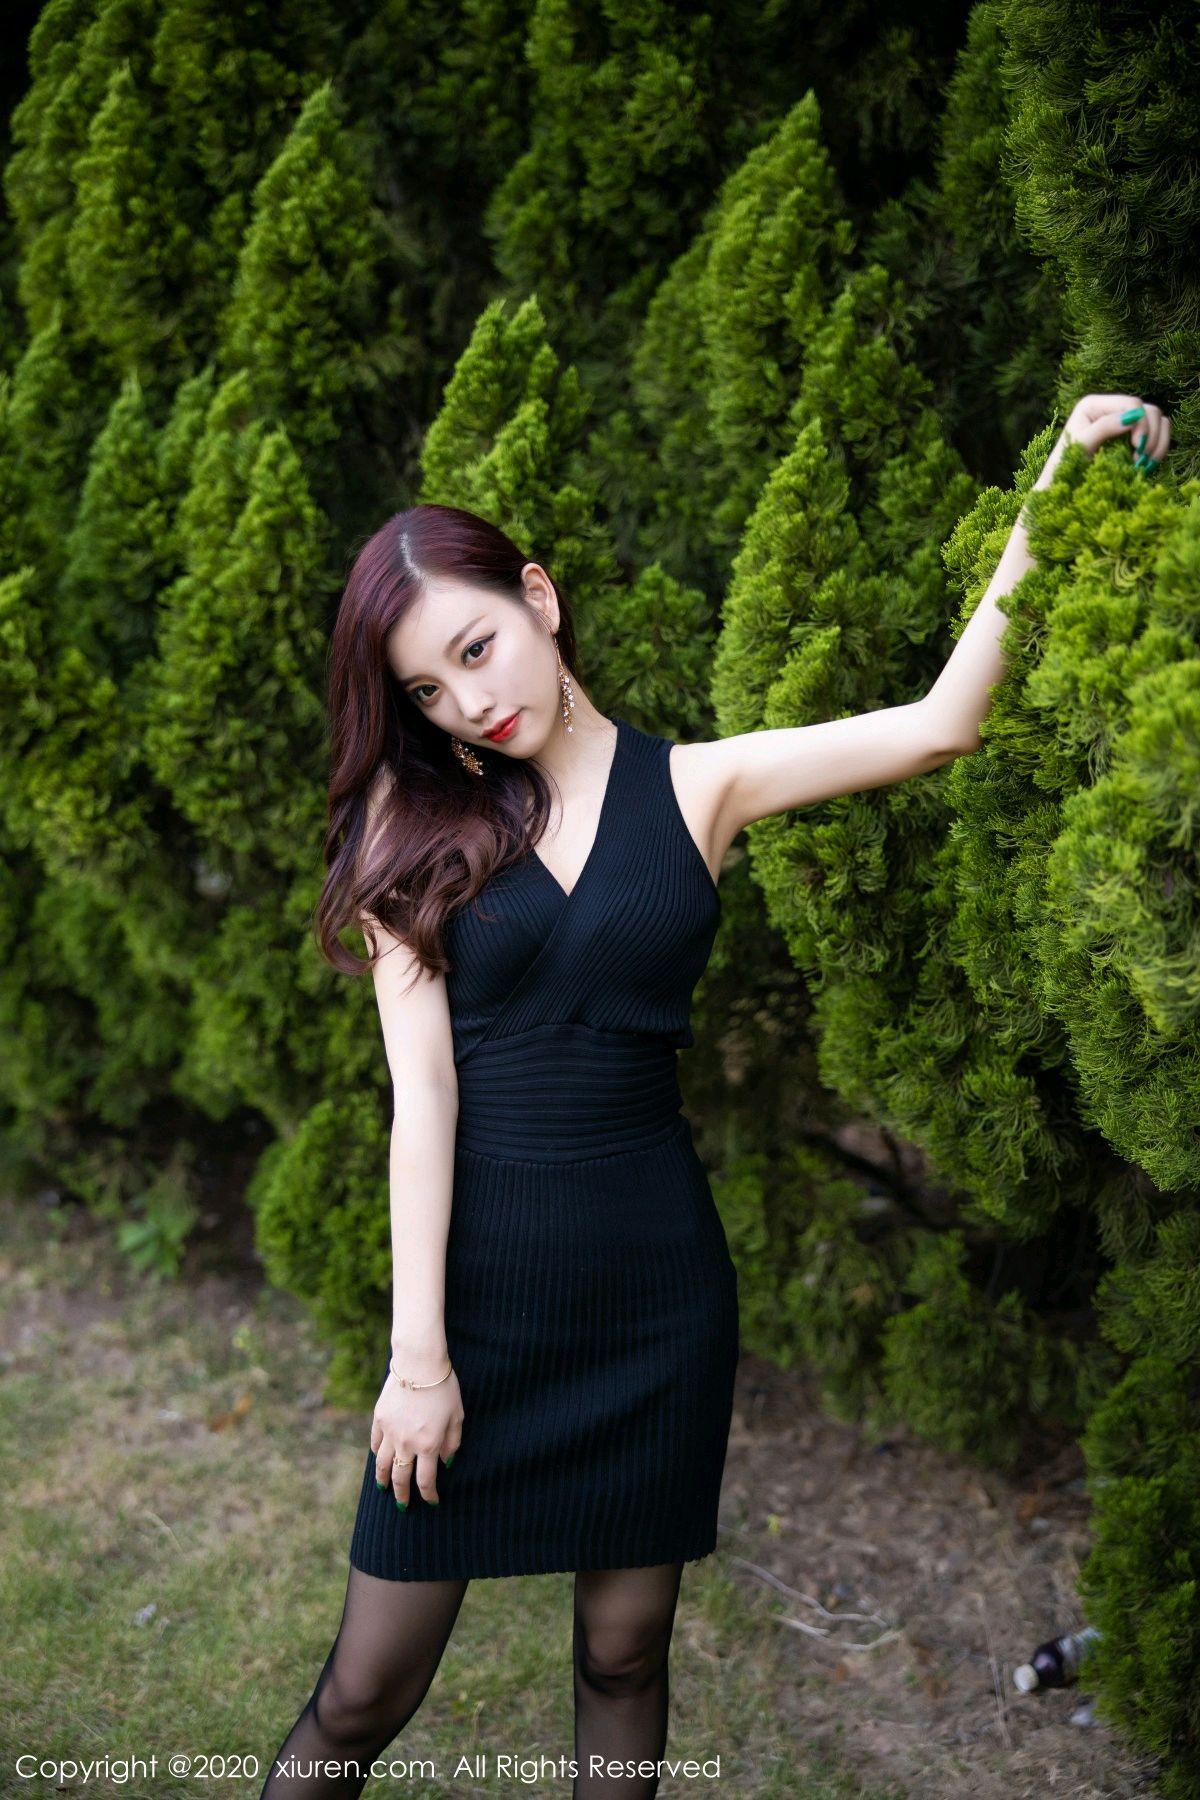 [XiuRen] Vol.2648 Yang Chen Chen 39P, Black Silk, Outdoor, Xiuren, Yang Chen Chen